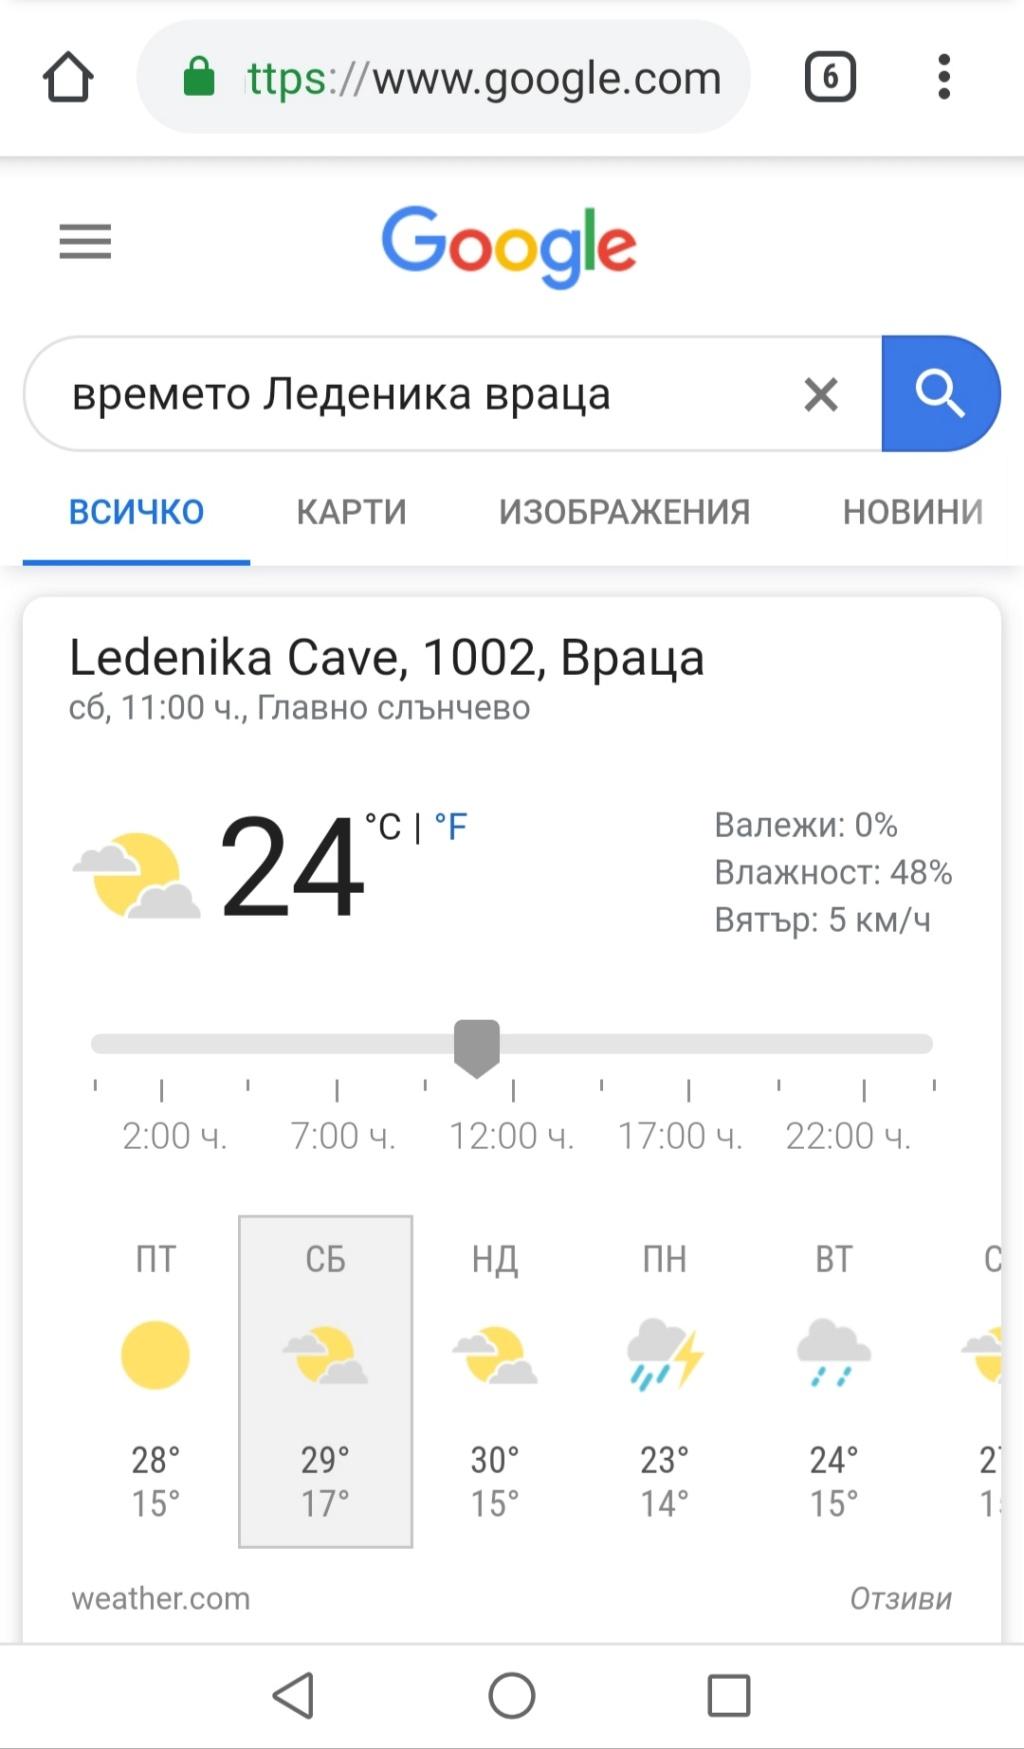 Национален събор на БАТСЗМ 27.07.2019 гр. Враца-Леденика Screen16